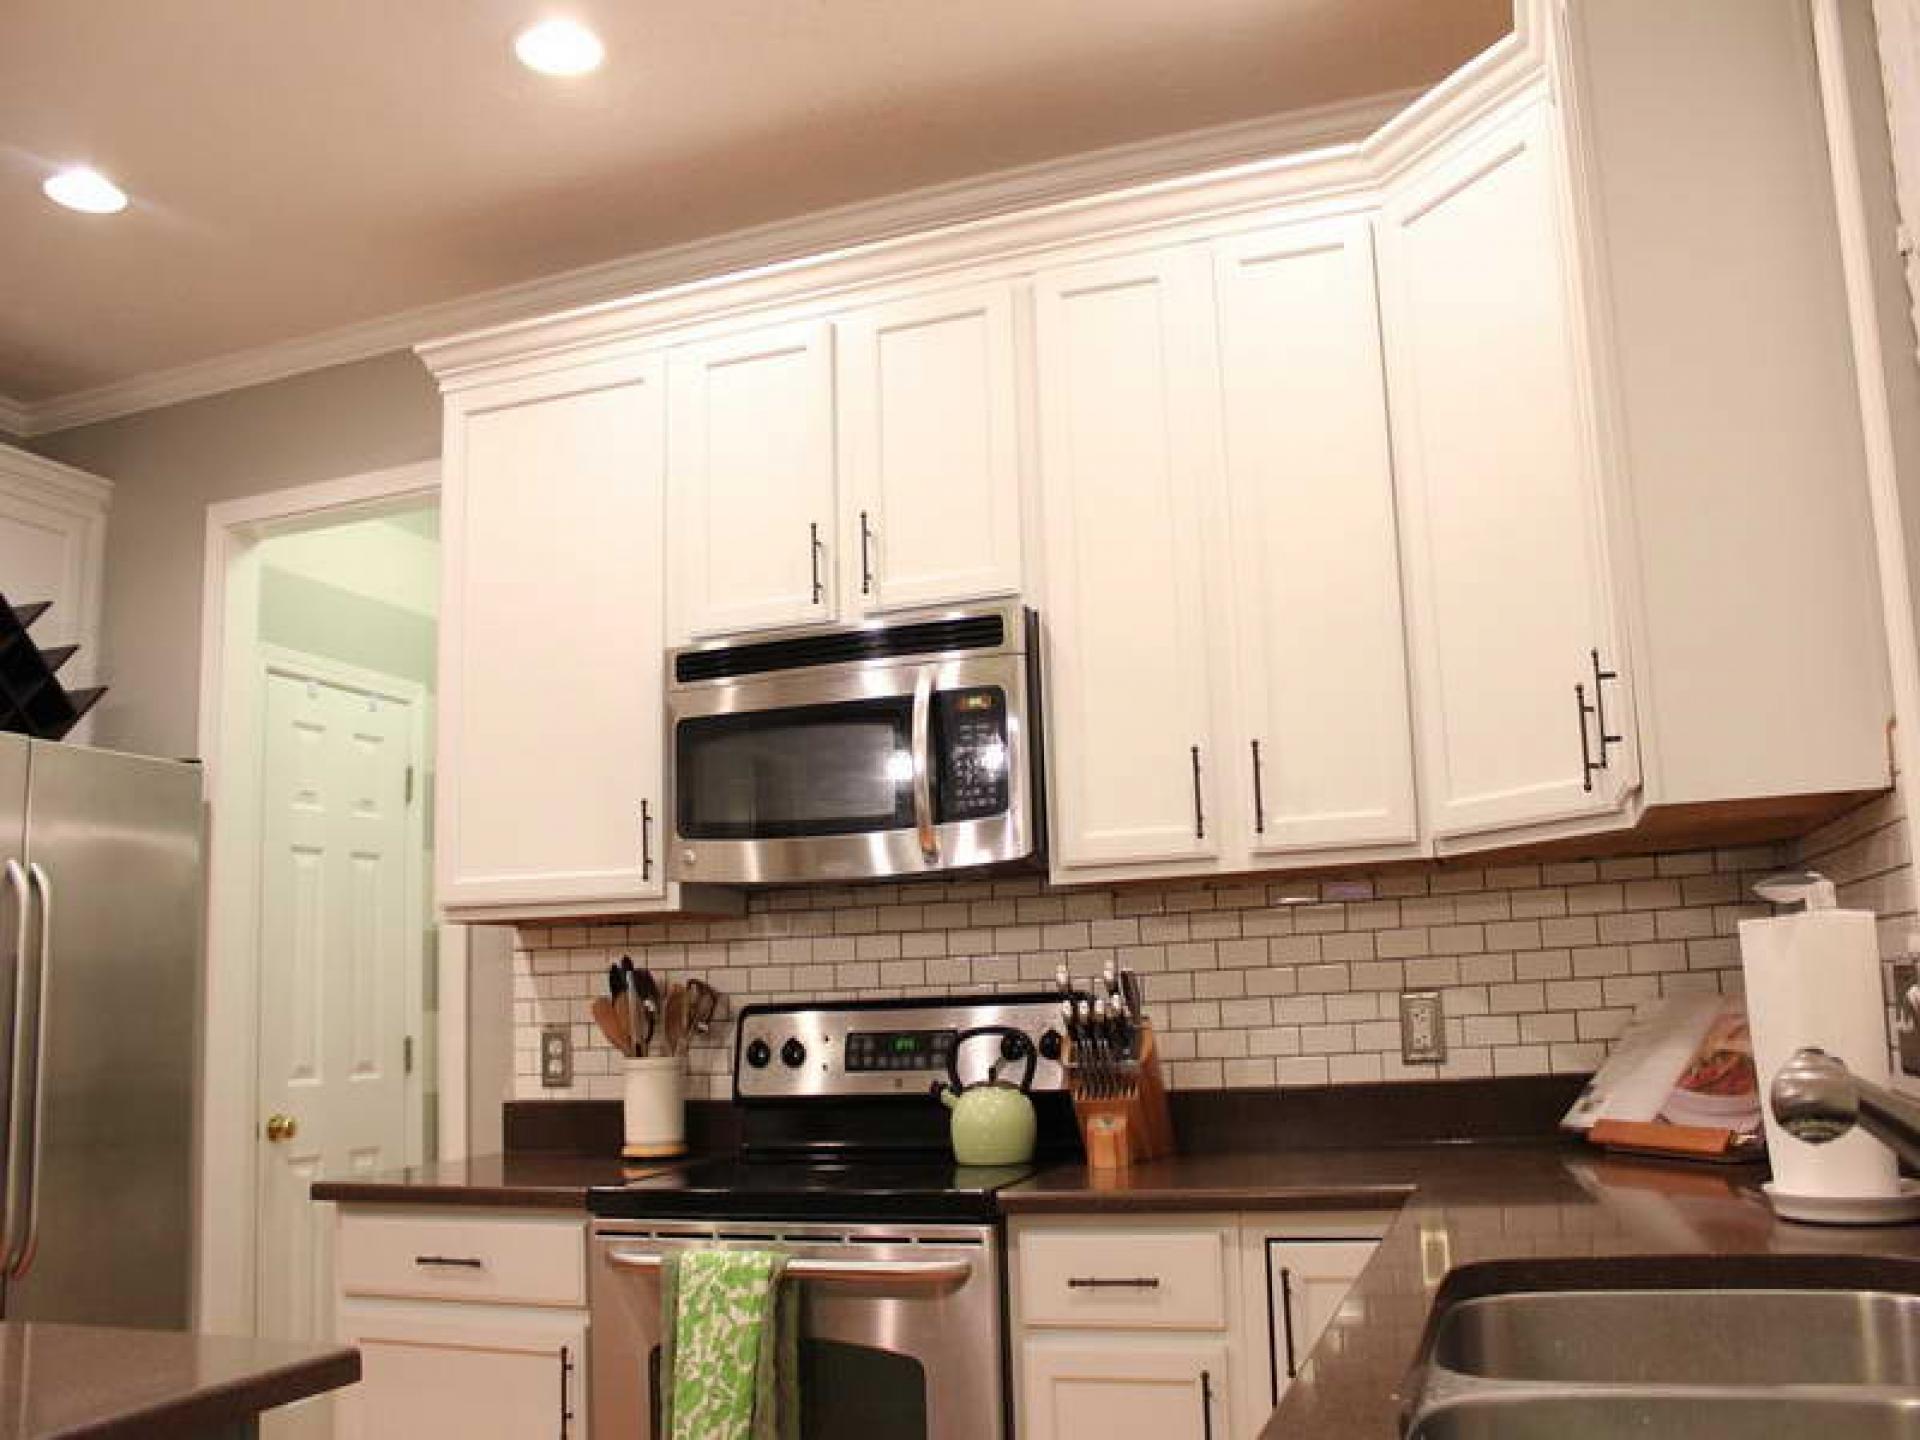 Cabinet Liberty Hardware Pulls Kitchen Cabinets Perfect Cabinet regarding size 1920 X 1440